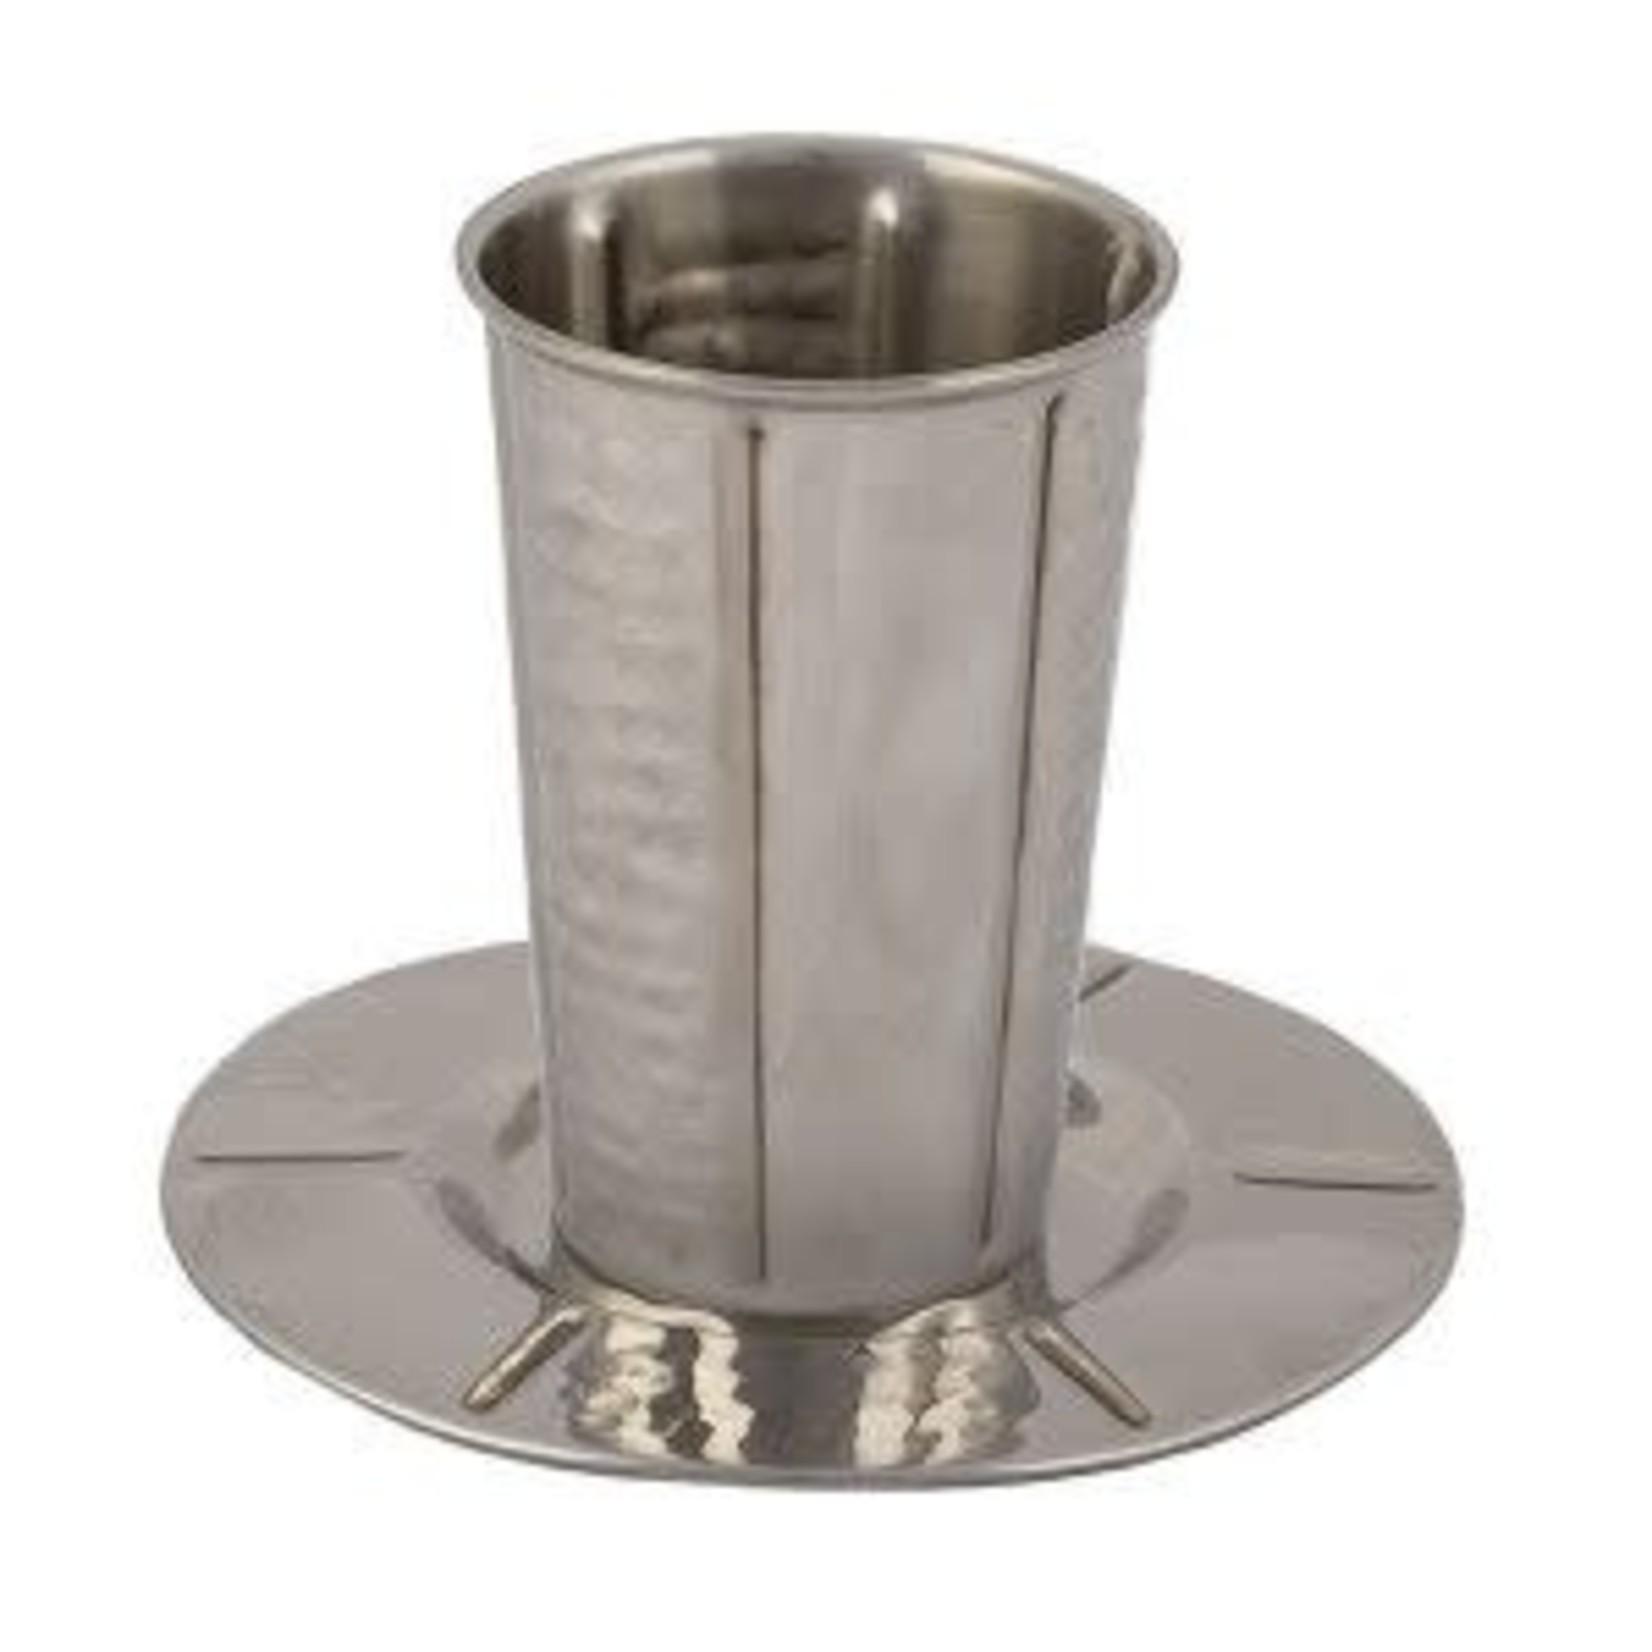 Yair Emanuel Kiddush Cup Set, Stemless, Stainless Steel